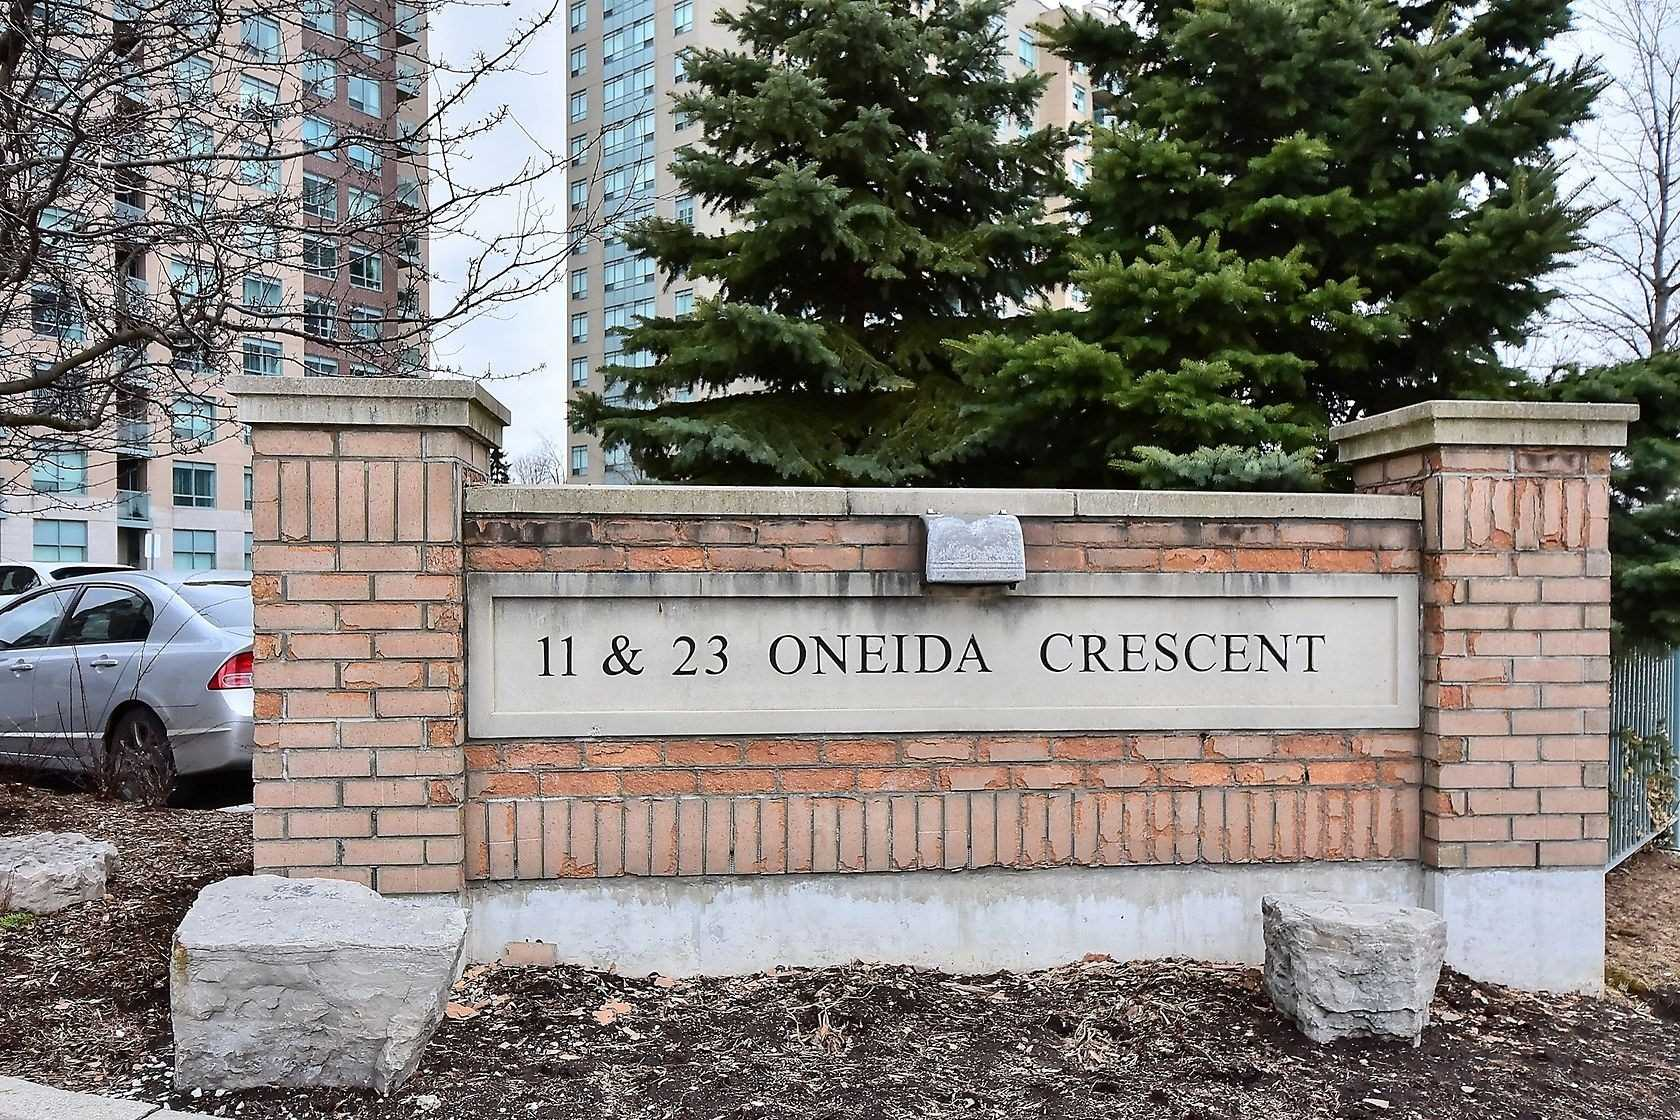 902-23-oneida-cres